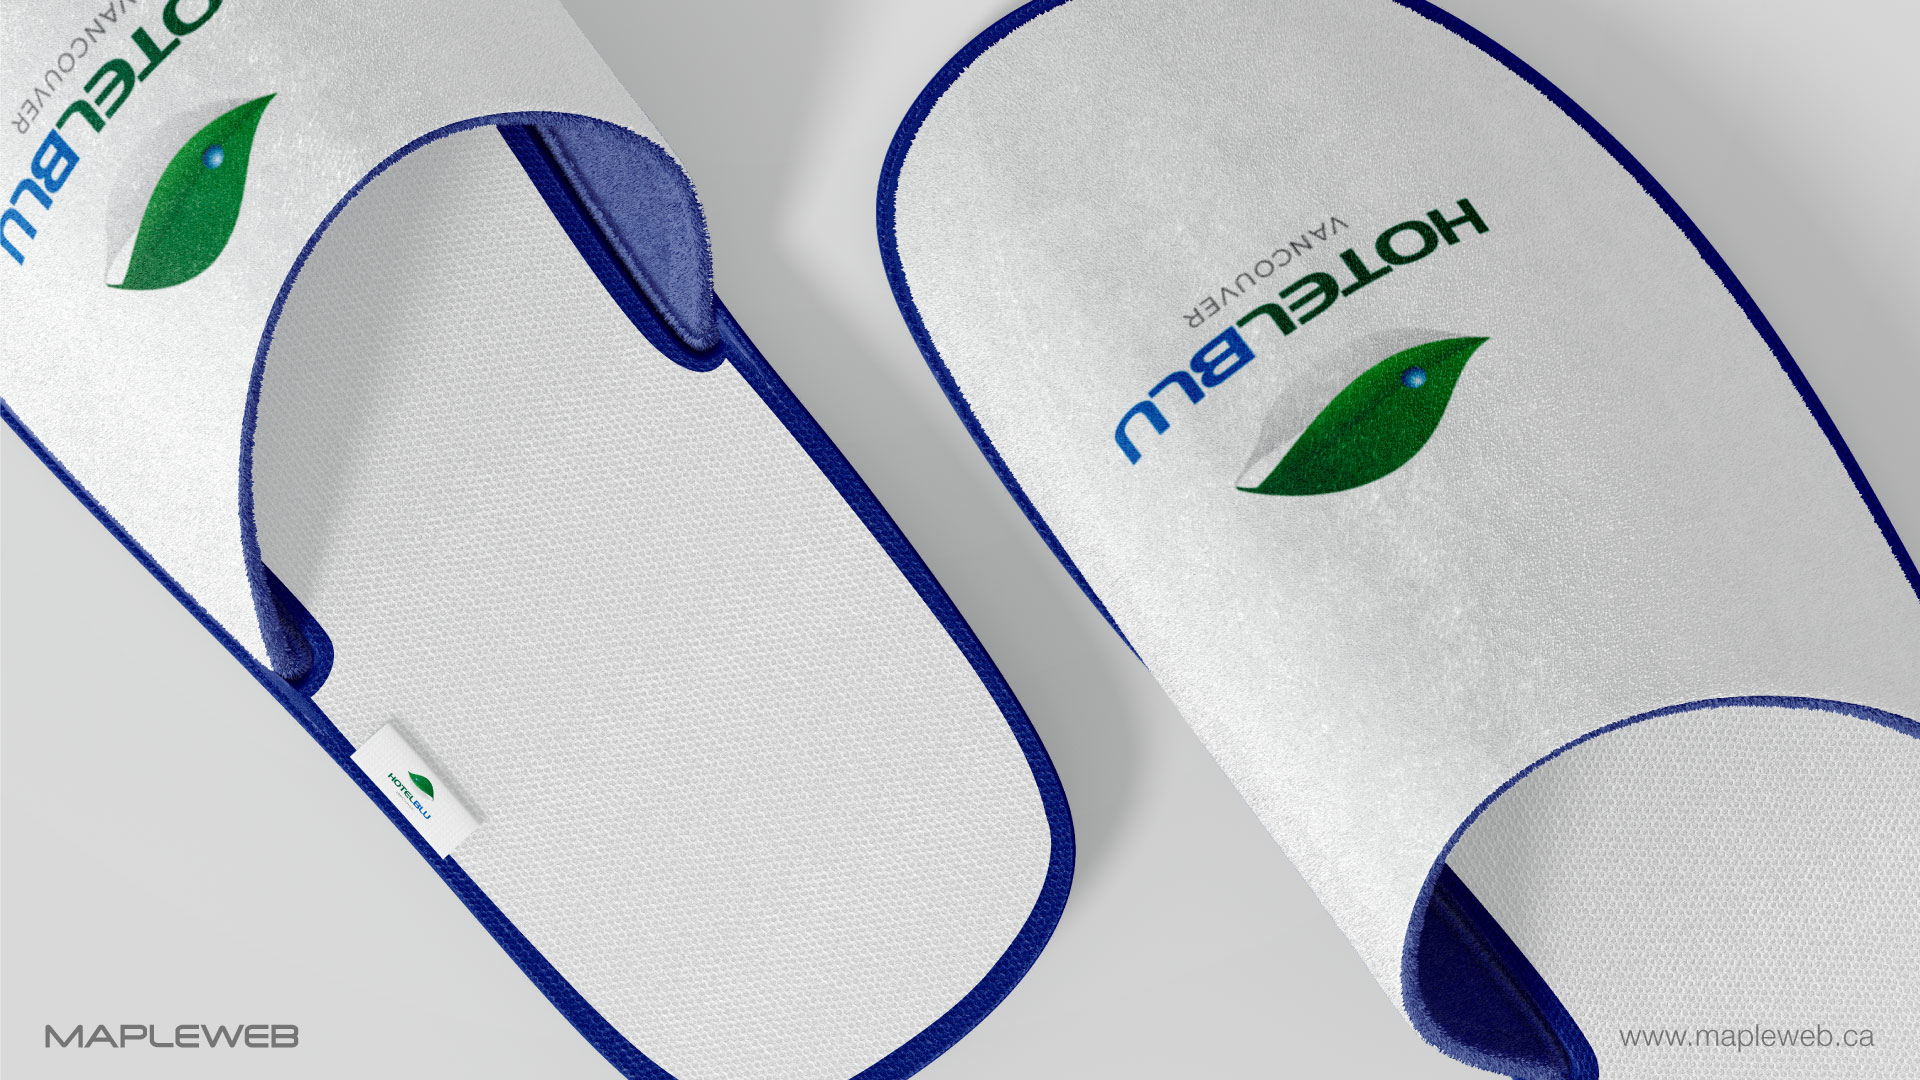 hotel-blu-brand-logo-design-by-mapleweb-vancouver-canada-slipper-mock